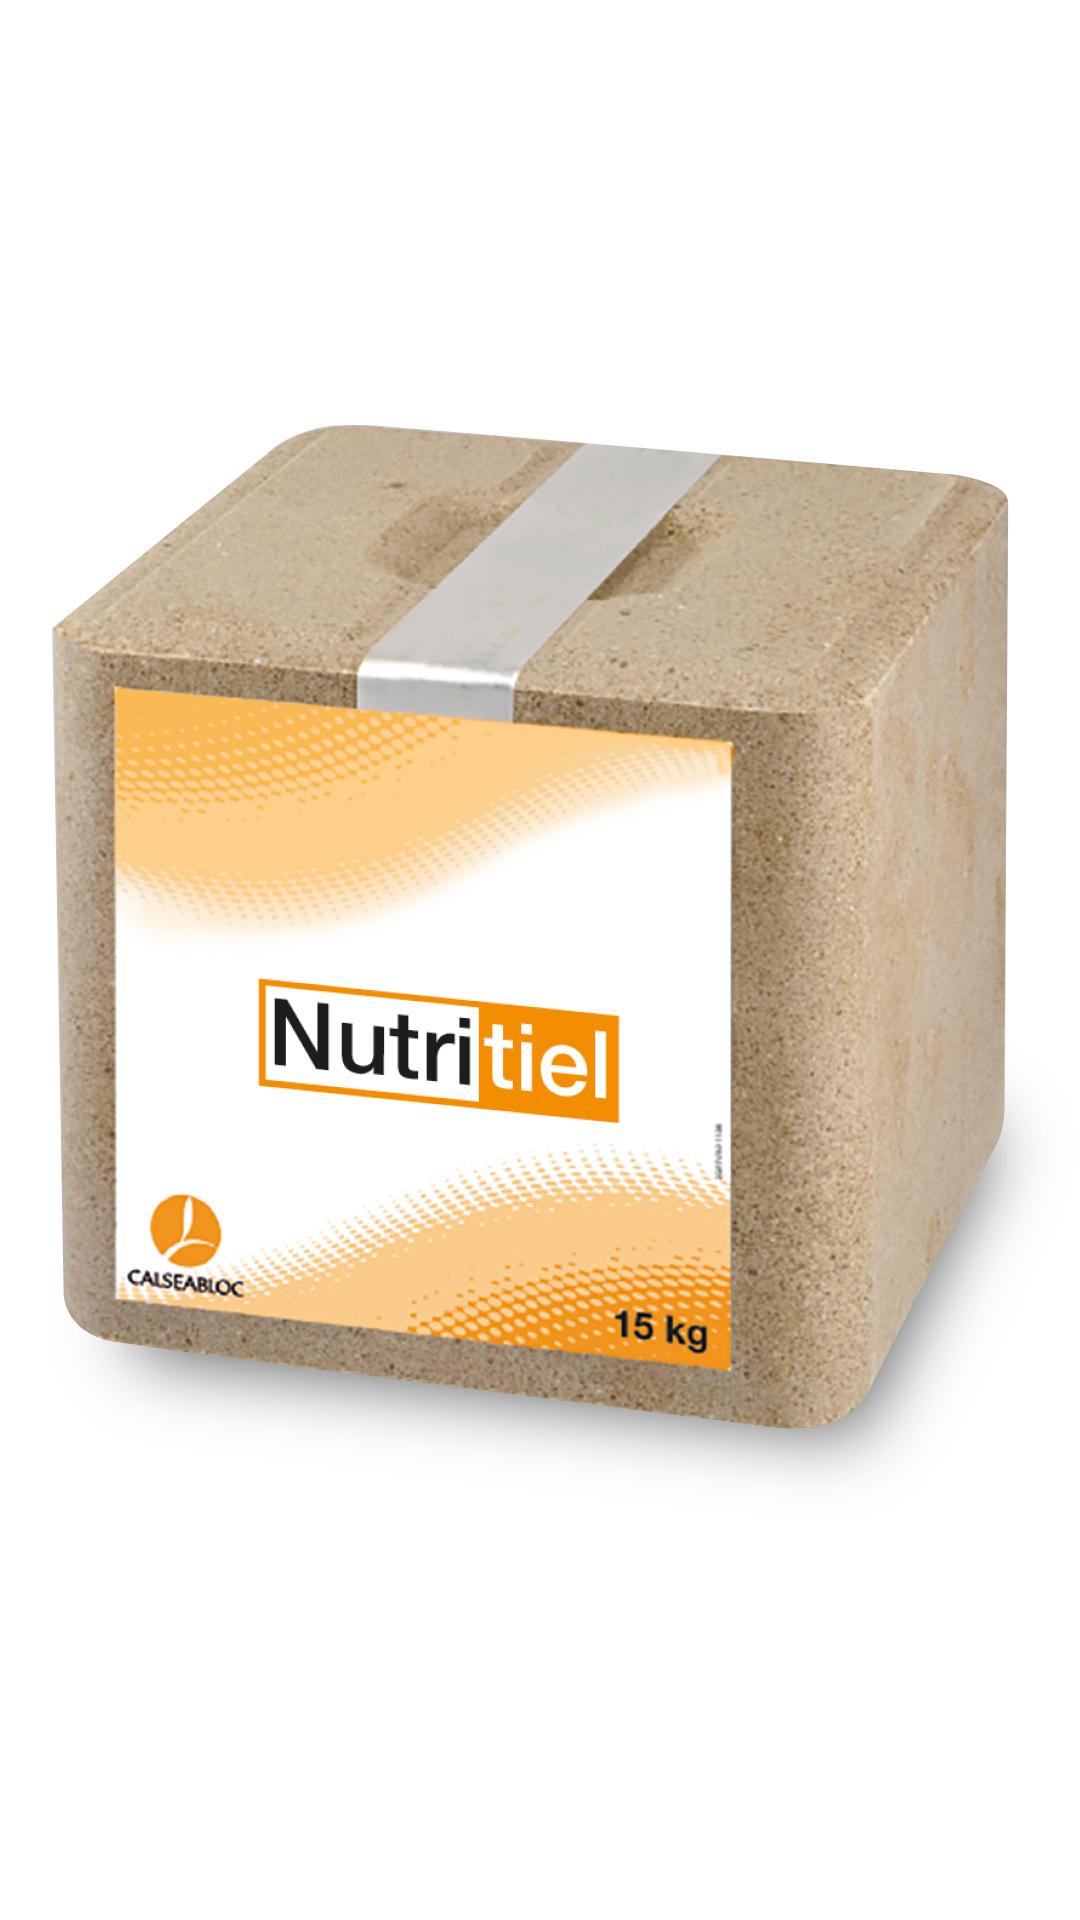 NUTRITIEL